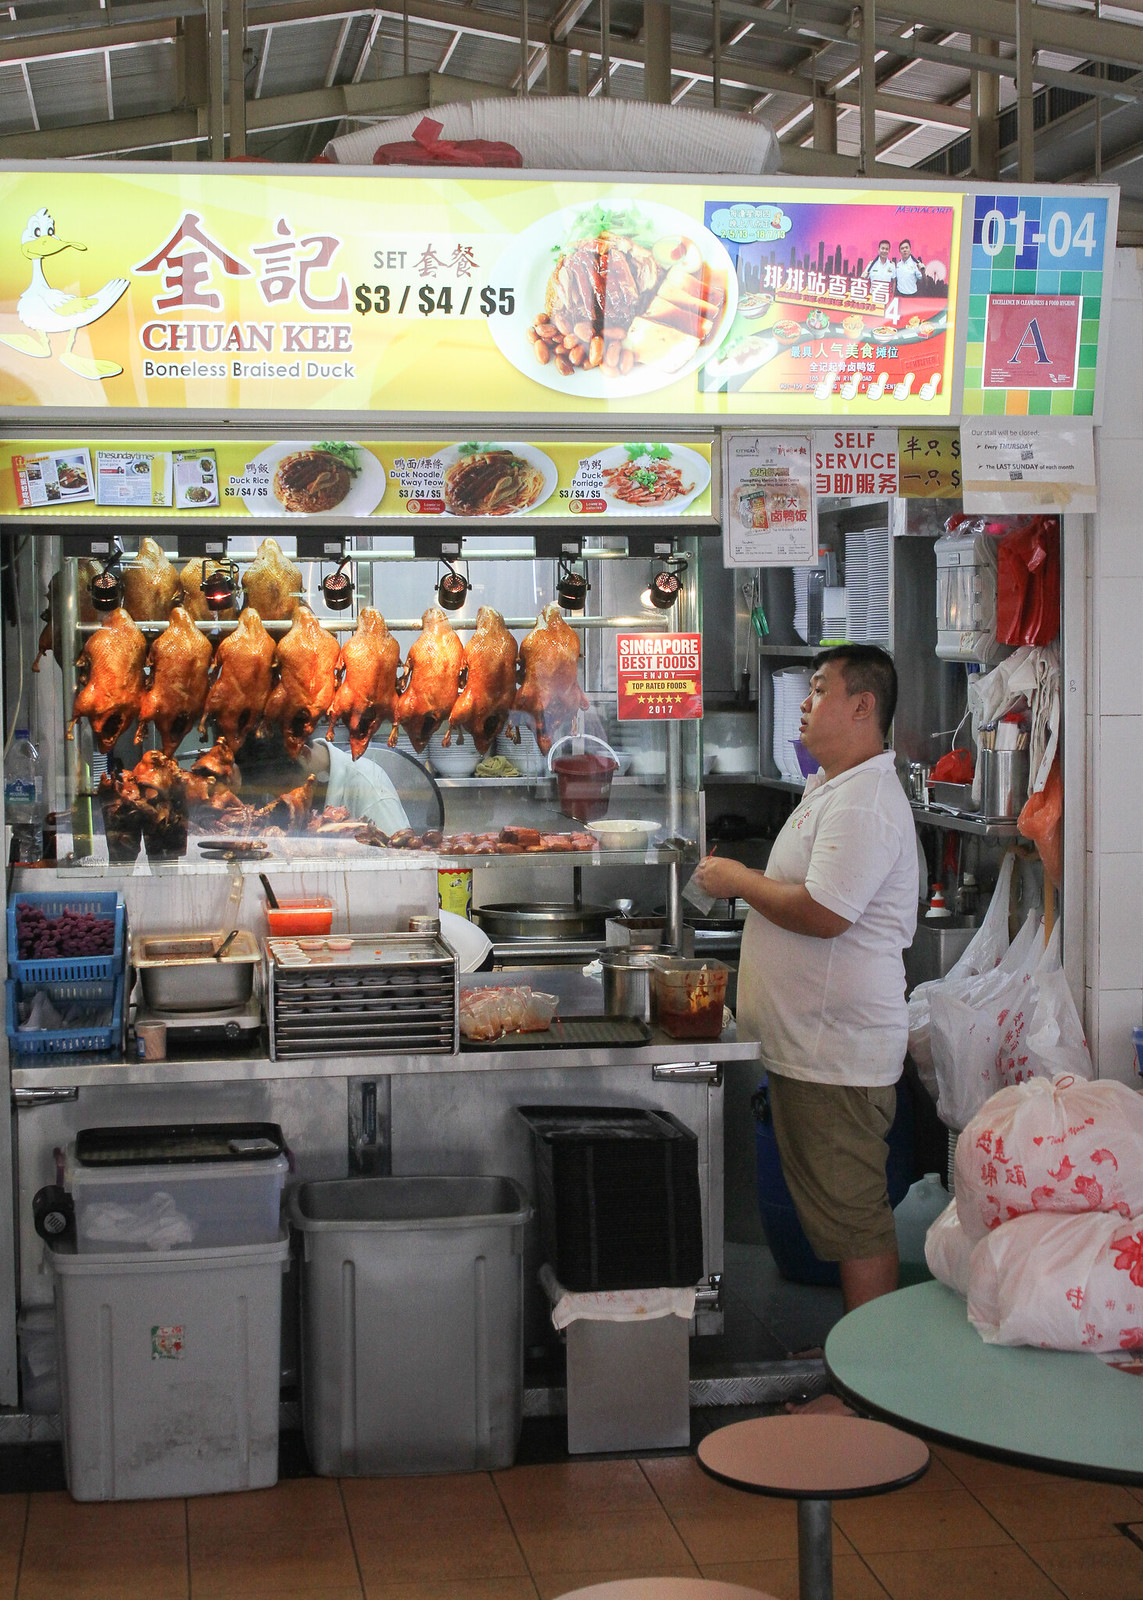 Chuan Kee Boneless Braised Duck Storefront